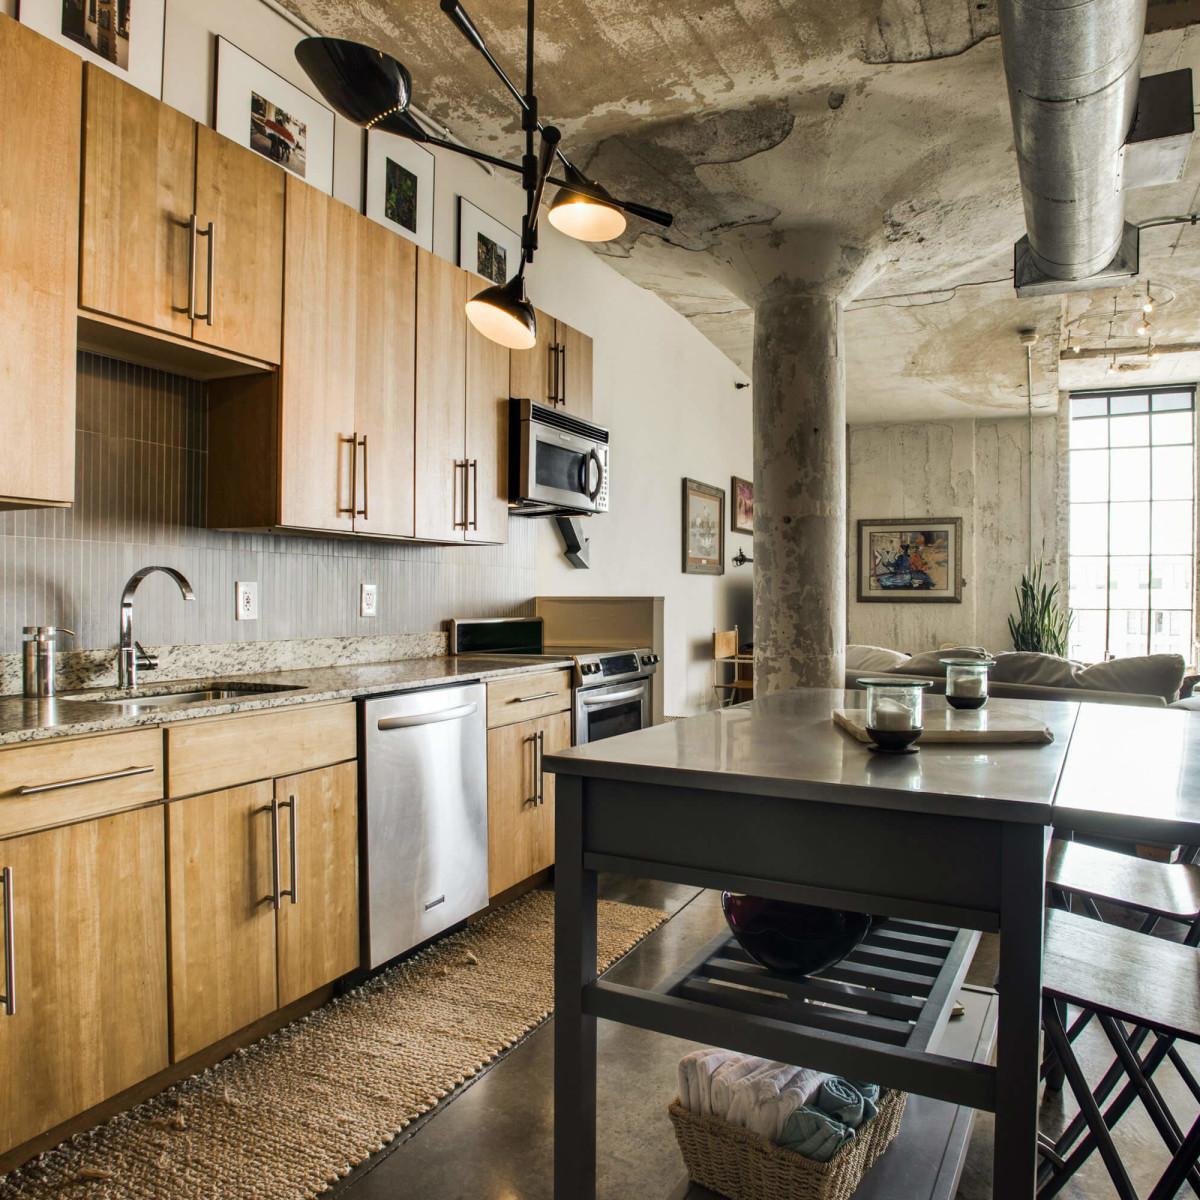 Kitchen at 1122 Jackson St. in Dallas